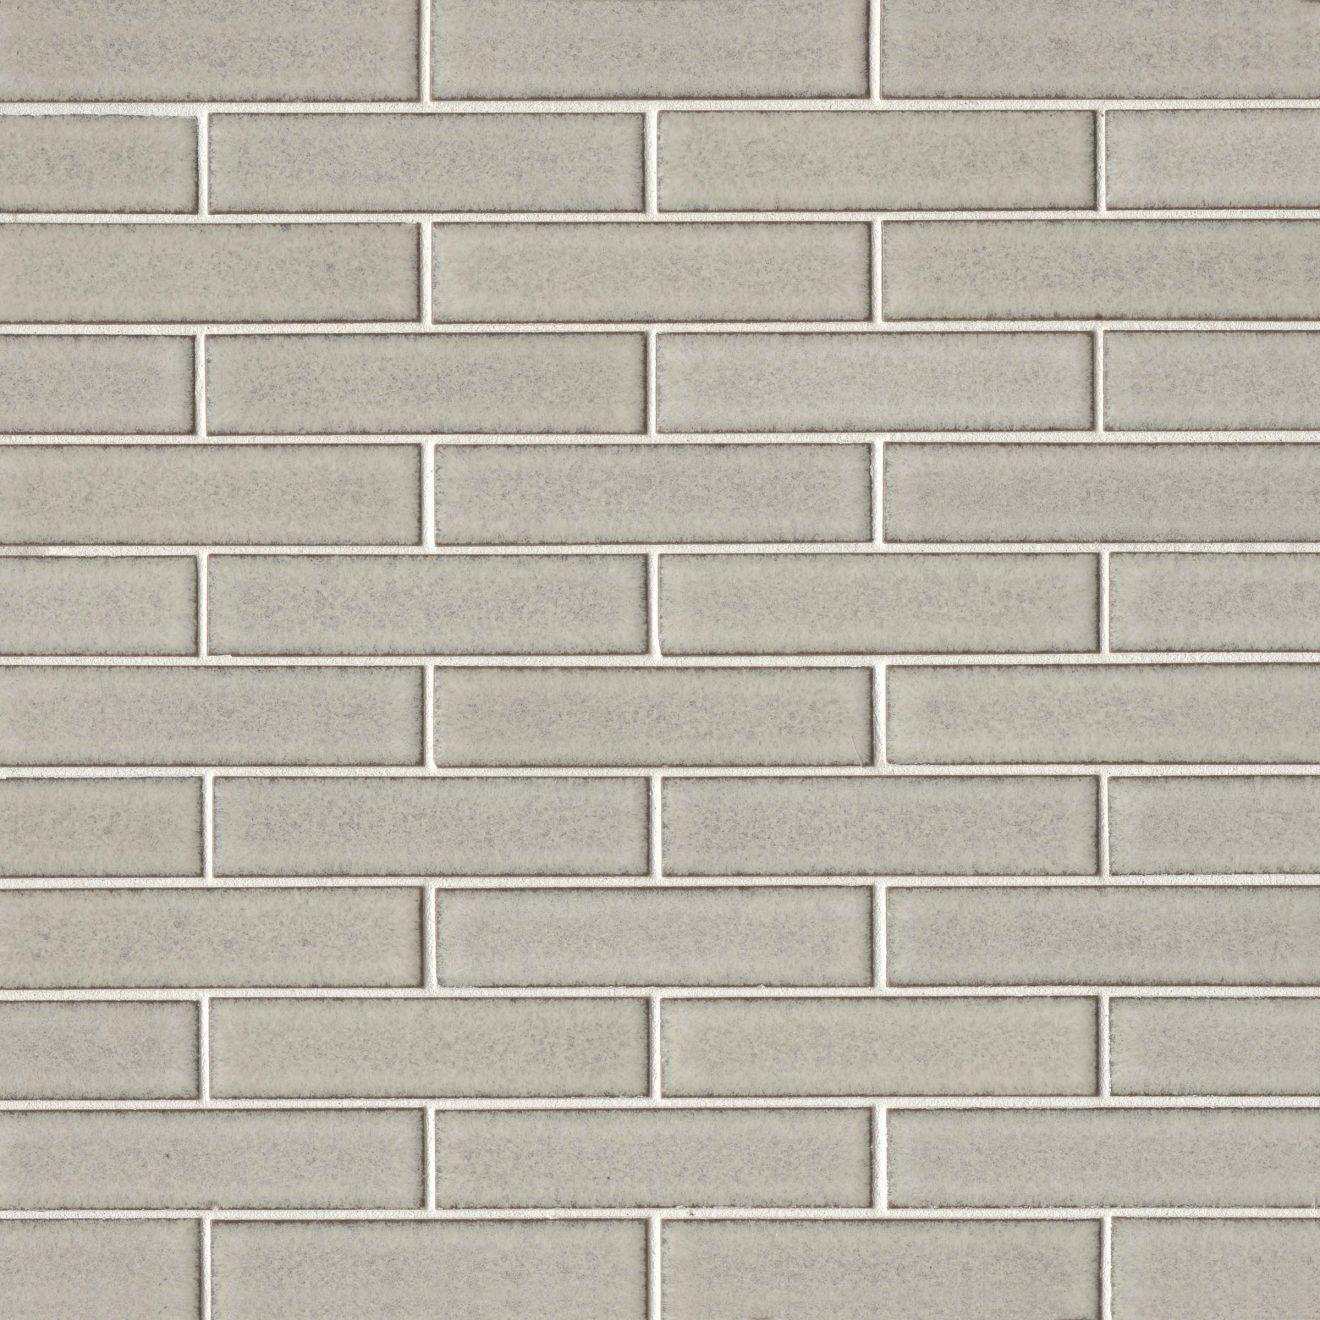 "Seni 1"" x 4"" Floor & Wall Mosaic in Pumice"